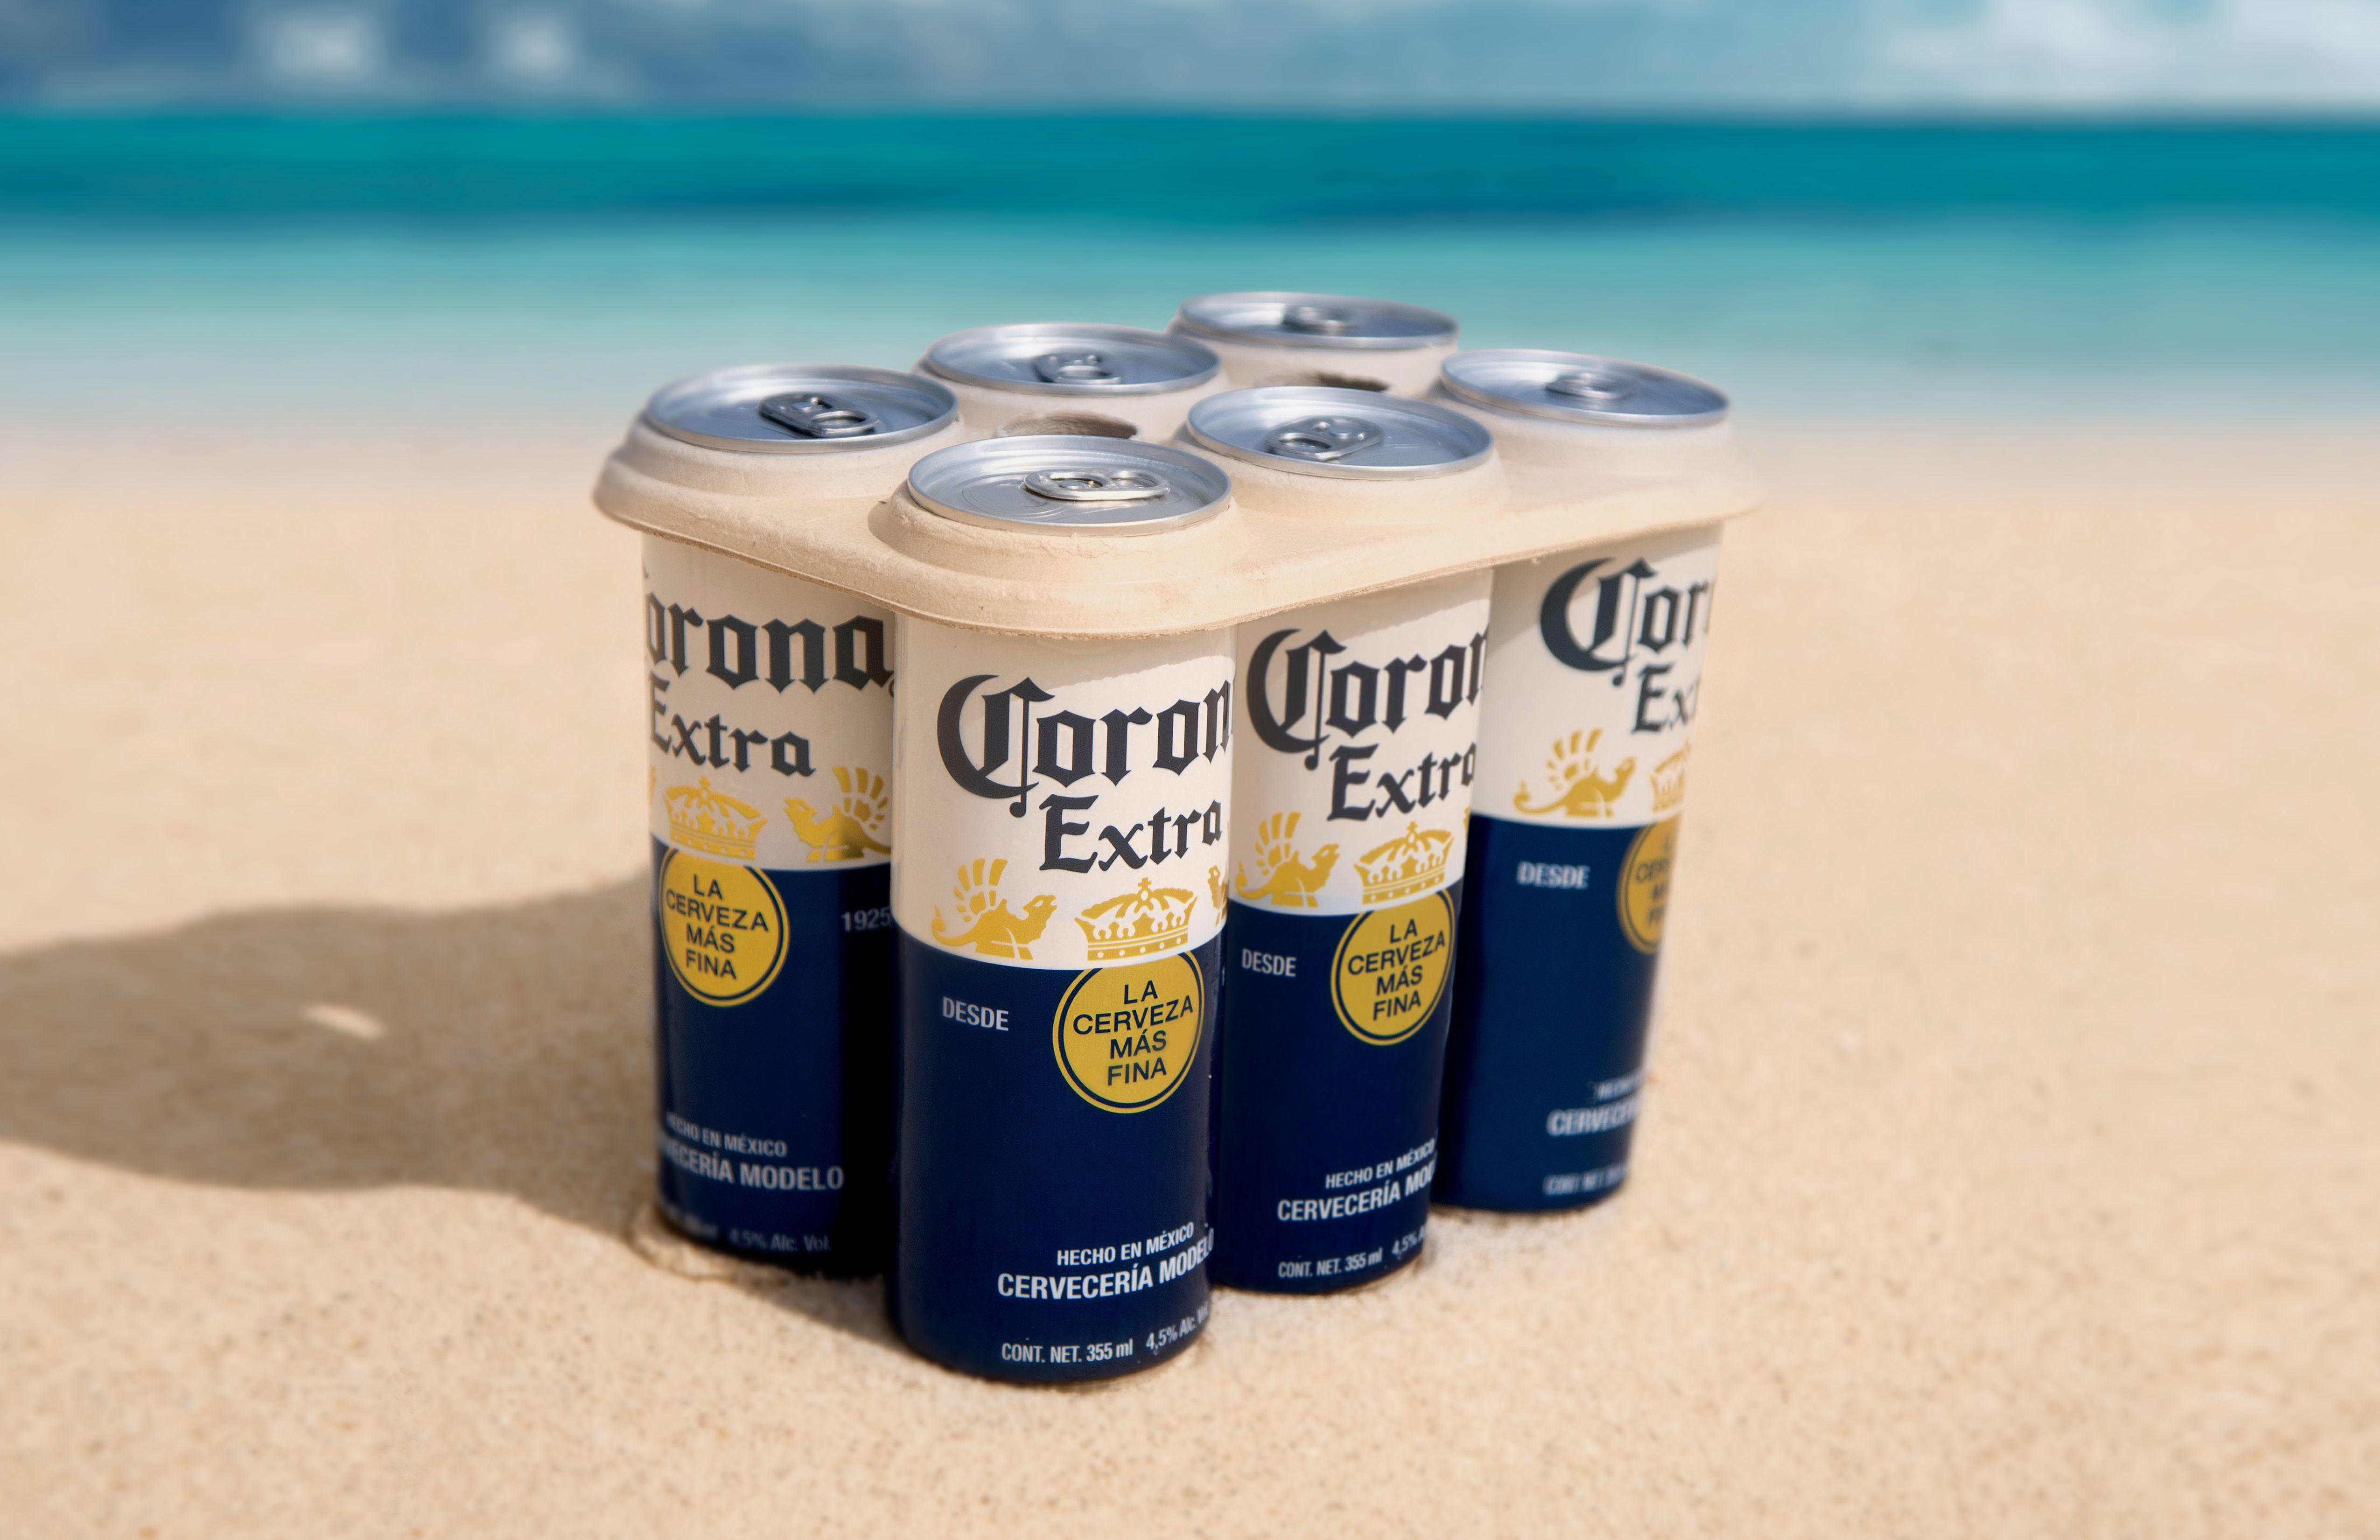 corona, birra, anelli plastic-free, plastica, packaging